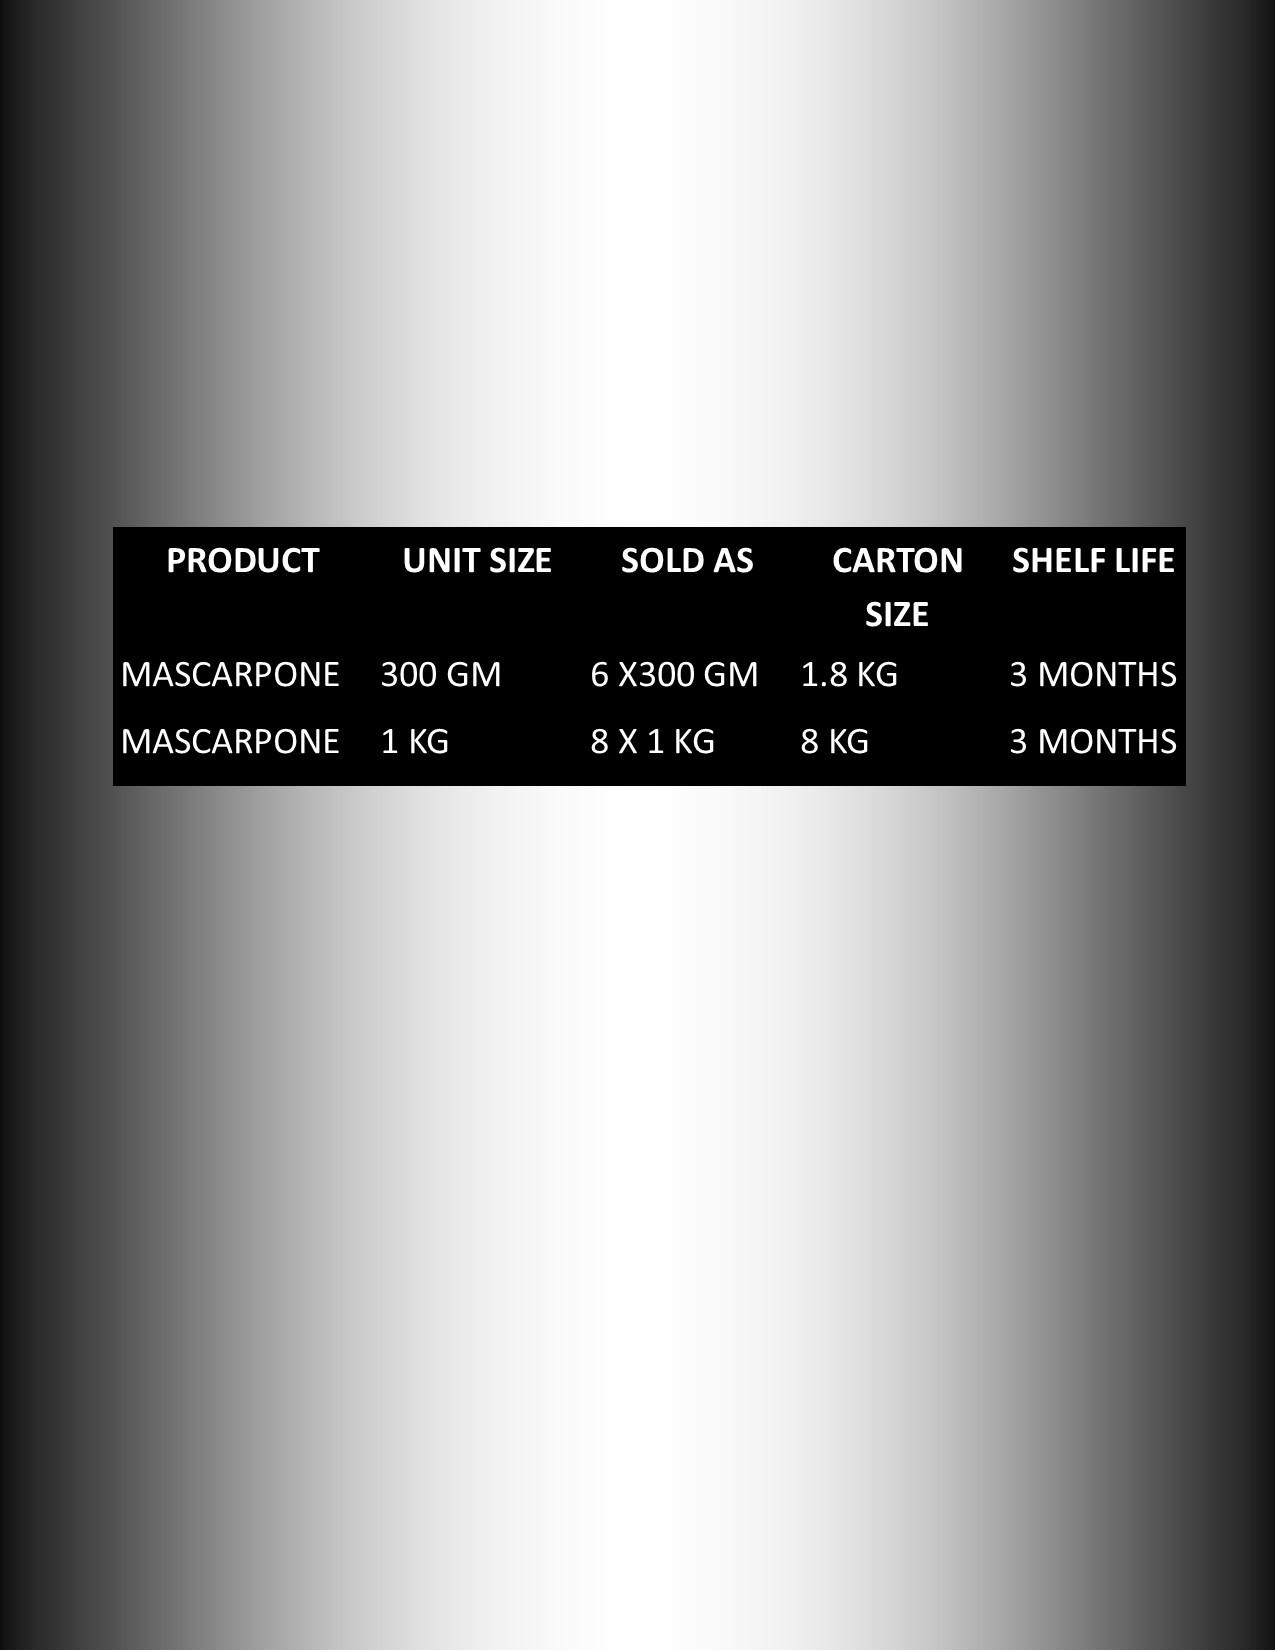 Mascarpone info V1